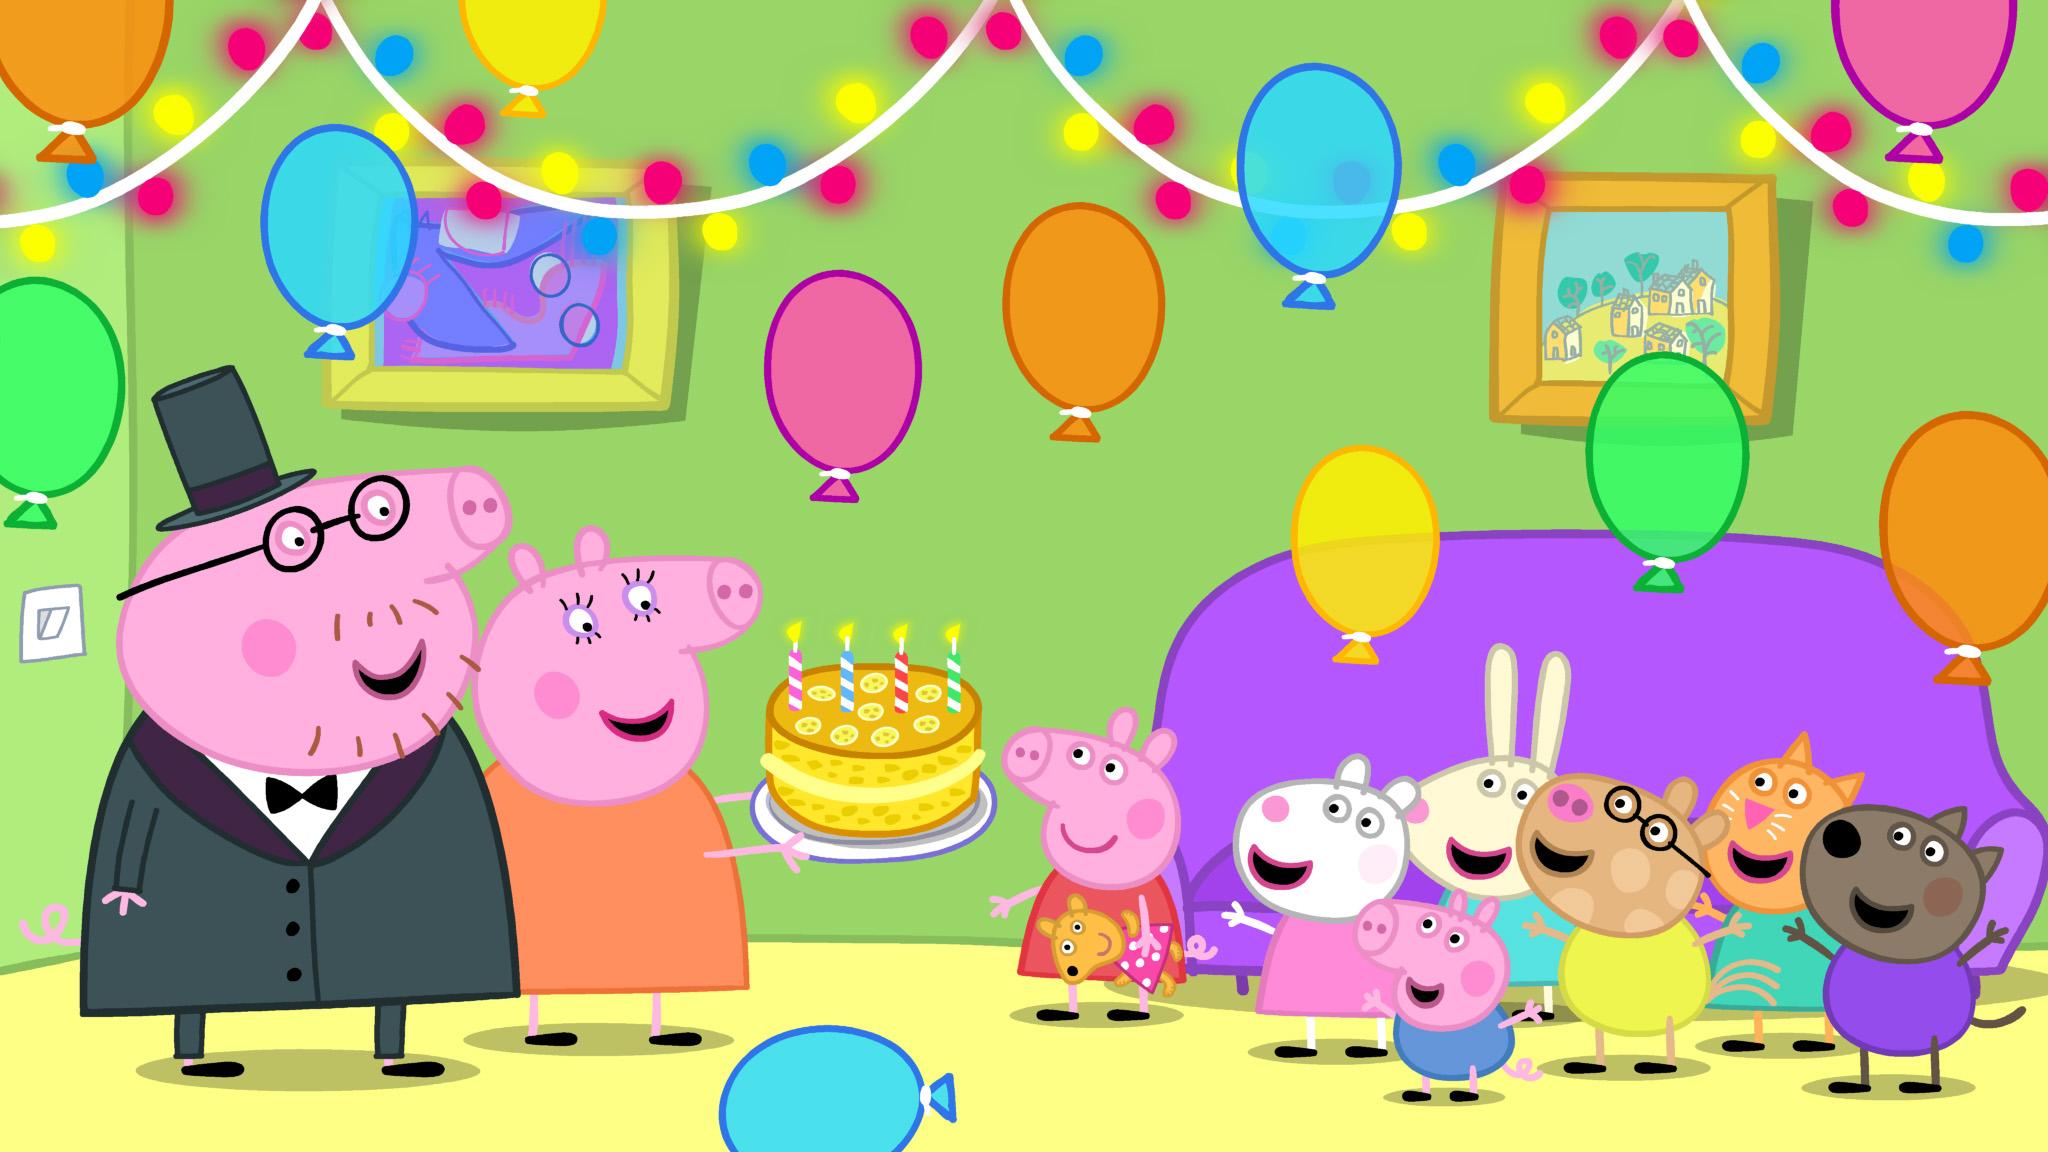 Painel Infantil Lona fosca Peppa Pig 1,50m x 1,00m - festa de aniversario |  Elo7